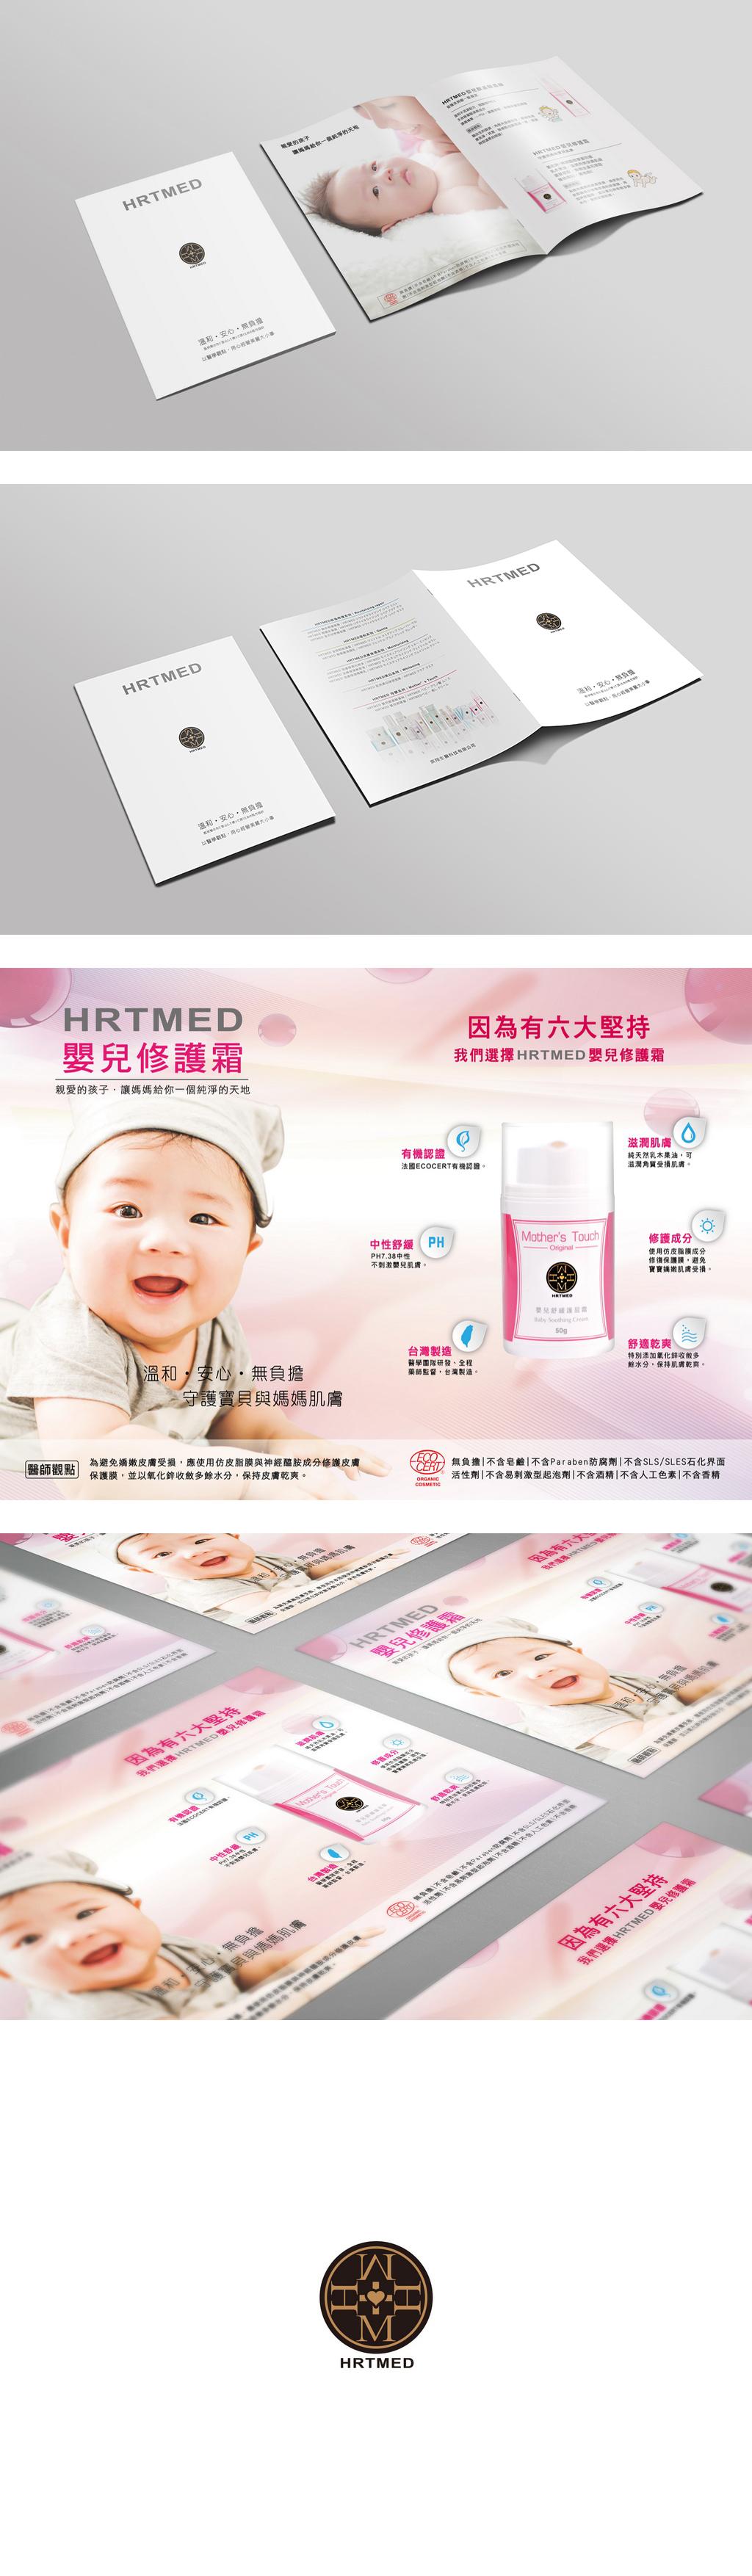 HRTMED嬰兒護霜平面DM